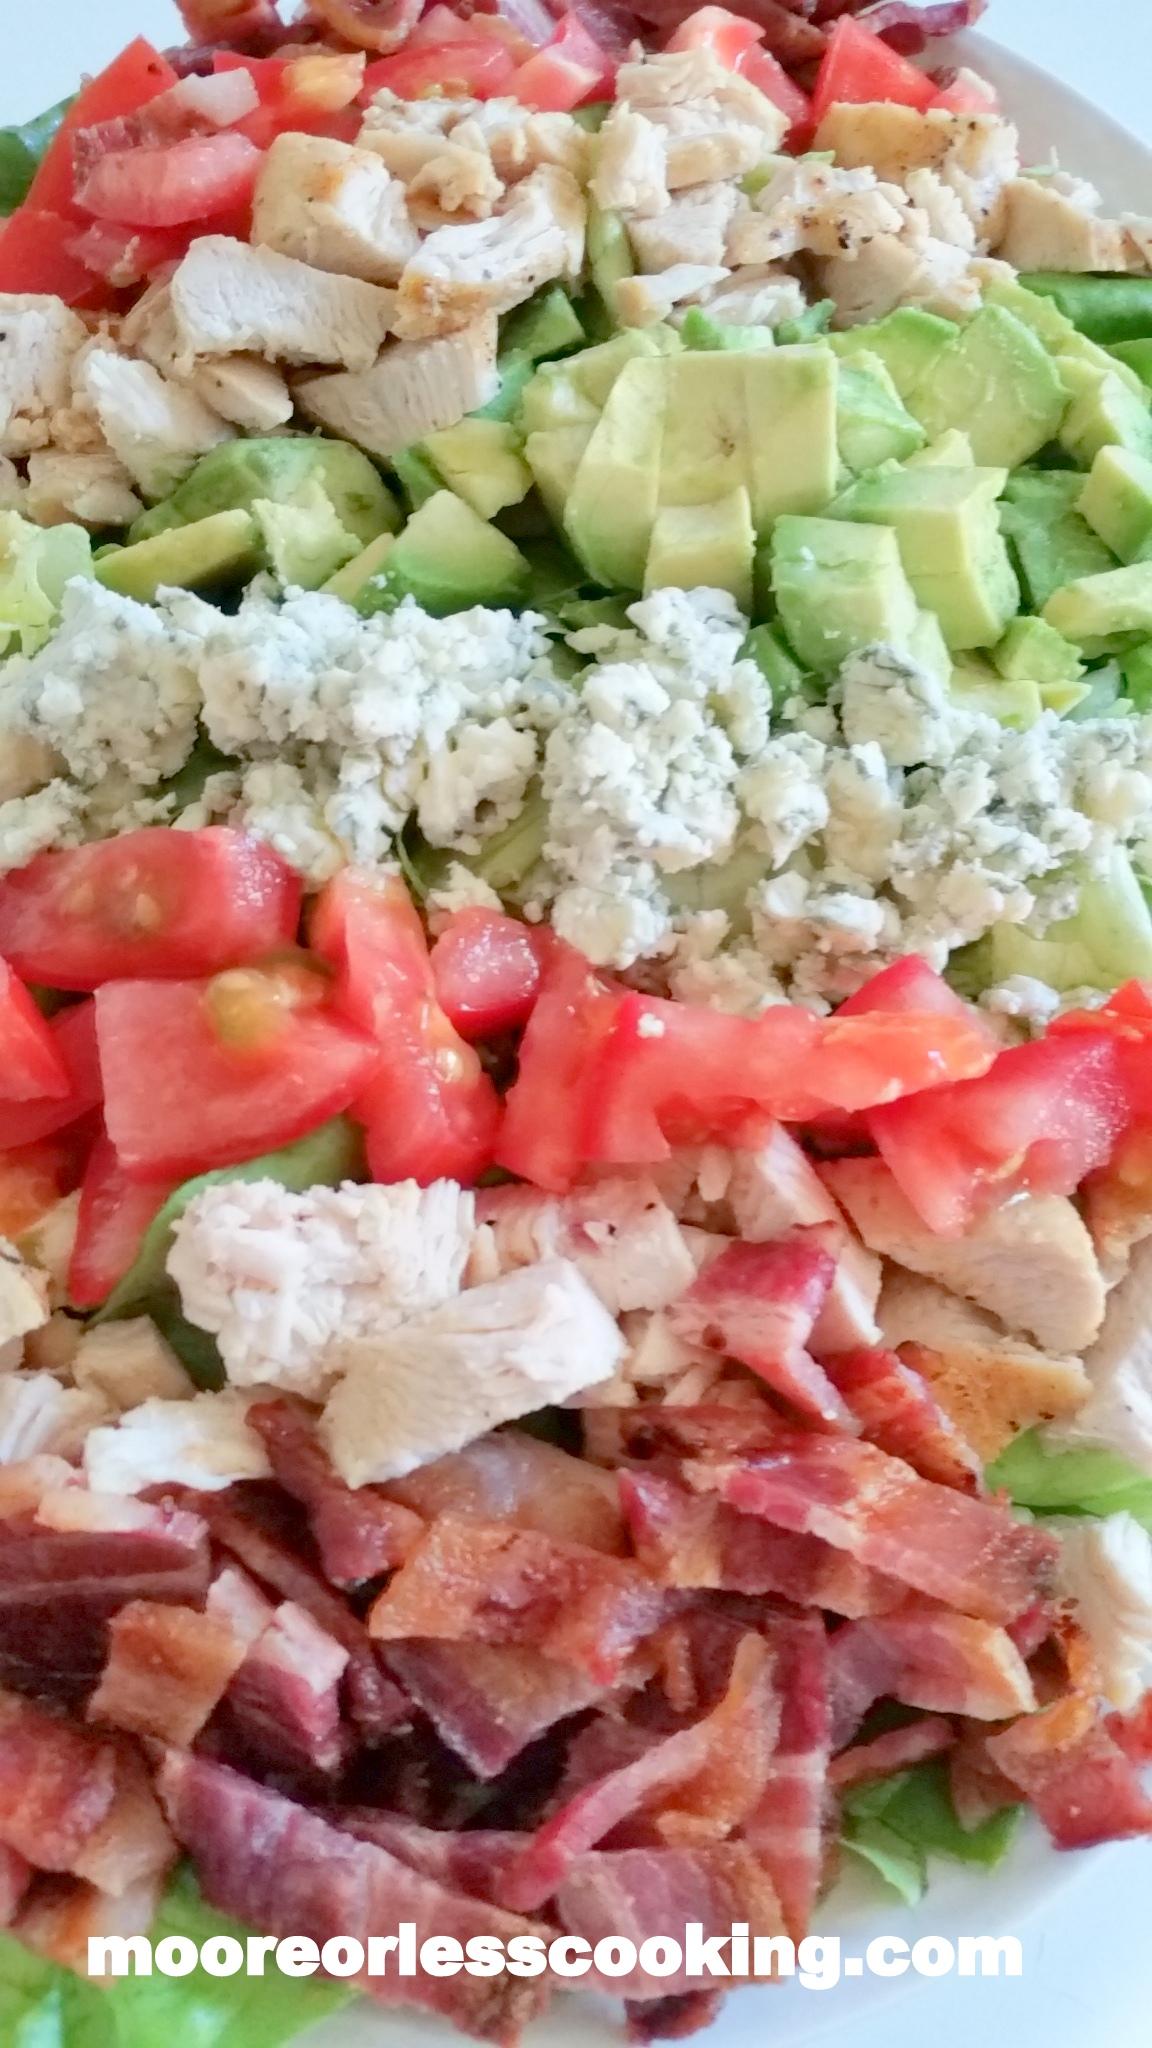 Easy to Make Cobb Salad